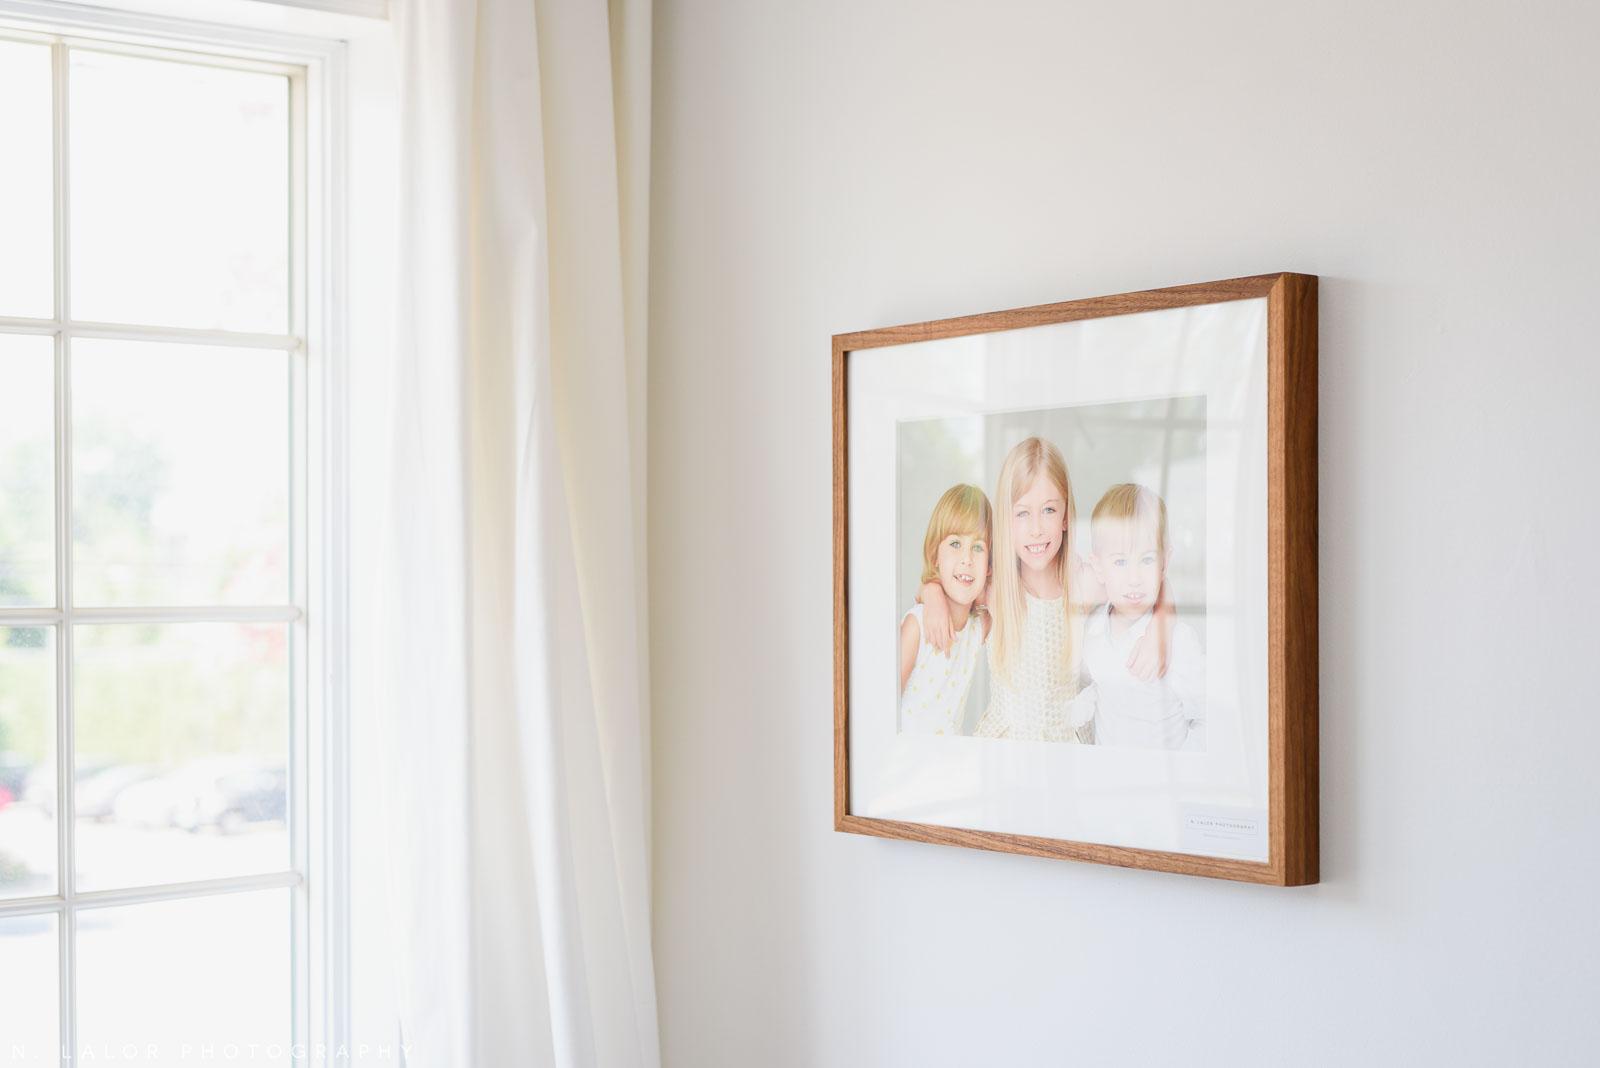 "N. Lalor Photography Studio - 11x14"" framed fine art print on the wall."